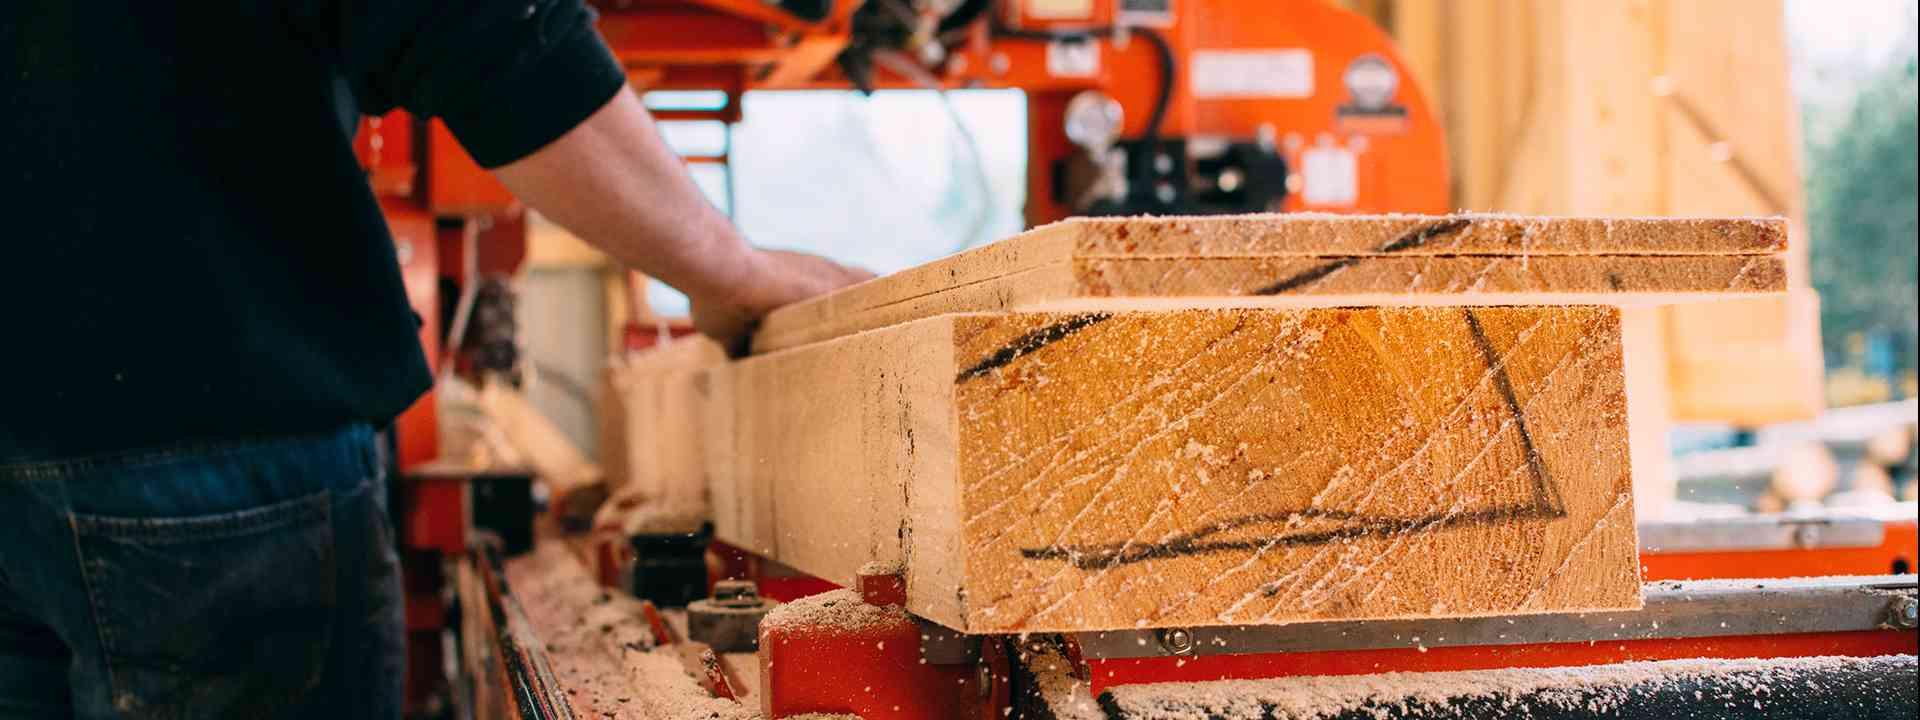 Wood-Mizer Sawmills and Wood Processing Equipment | Wood-Mizer Canada